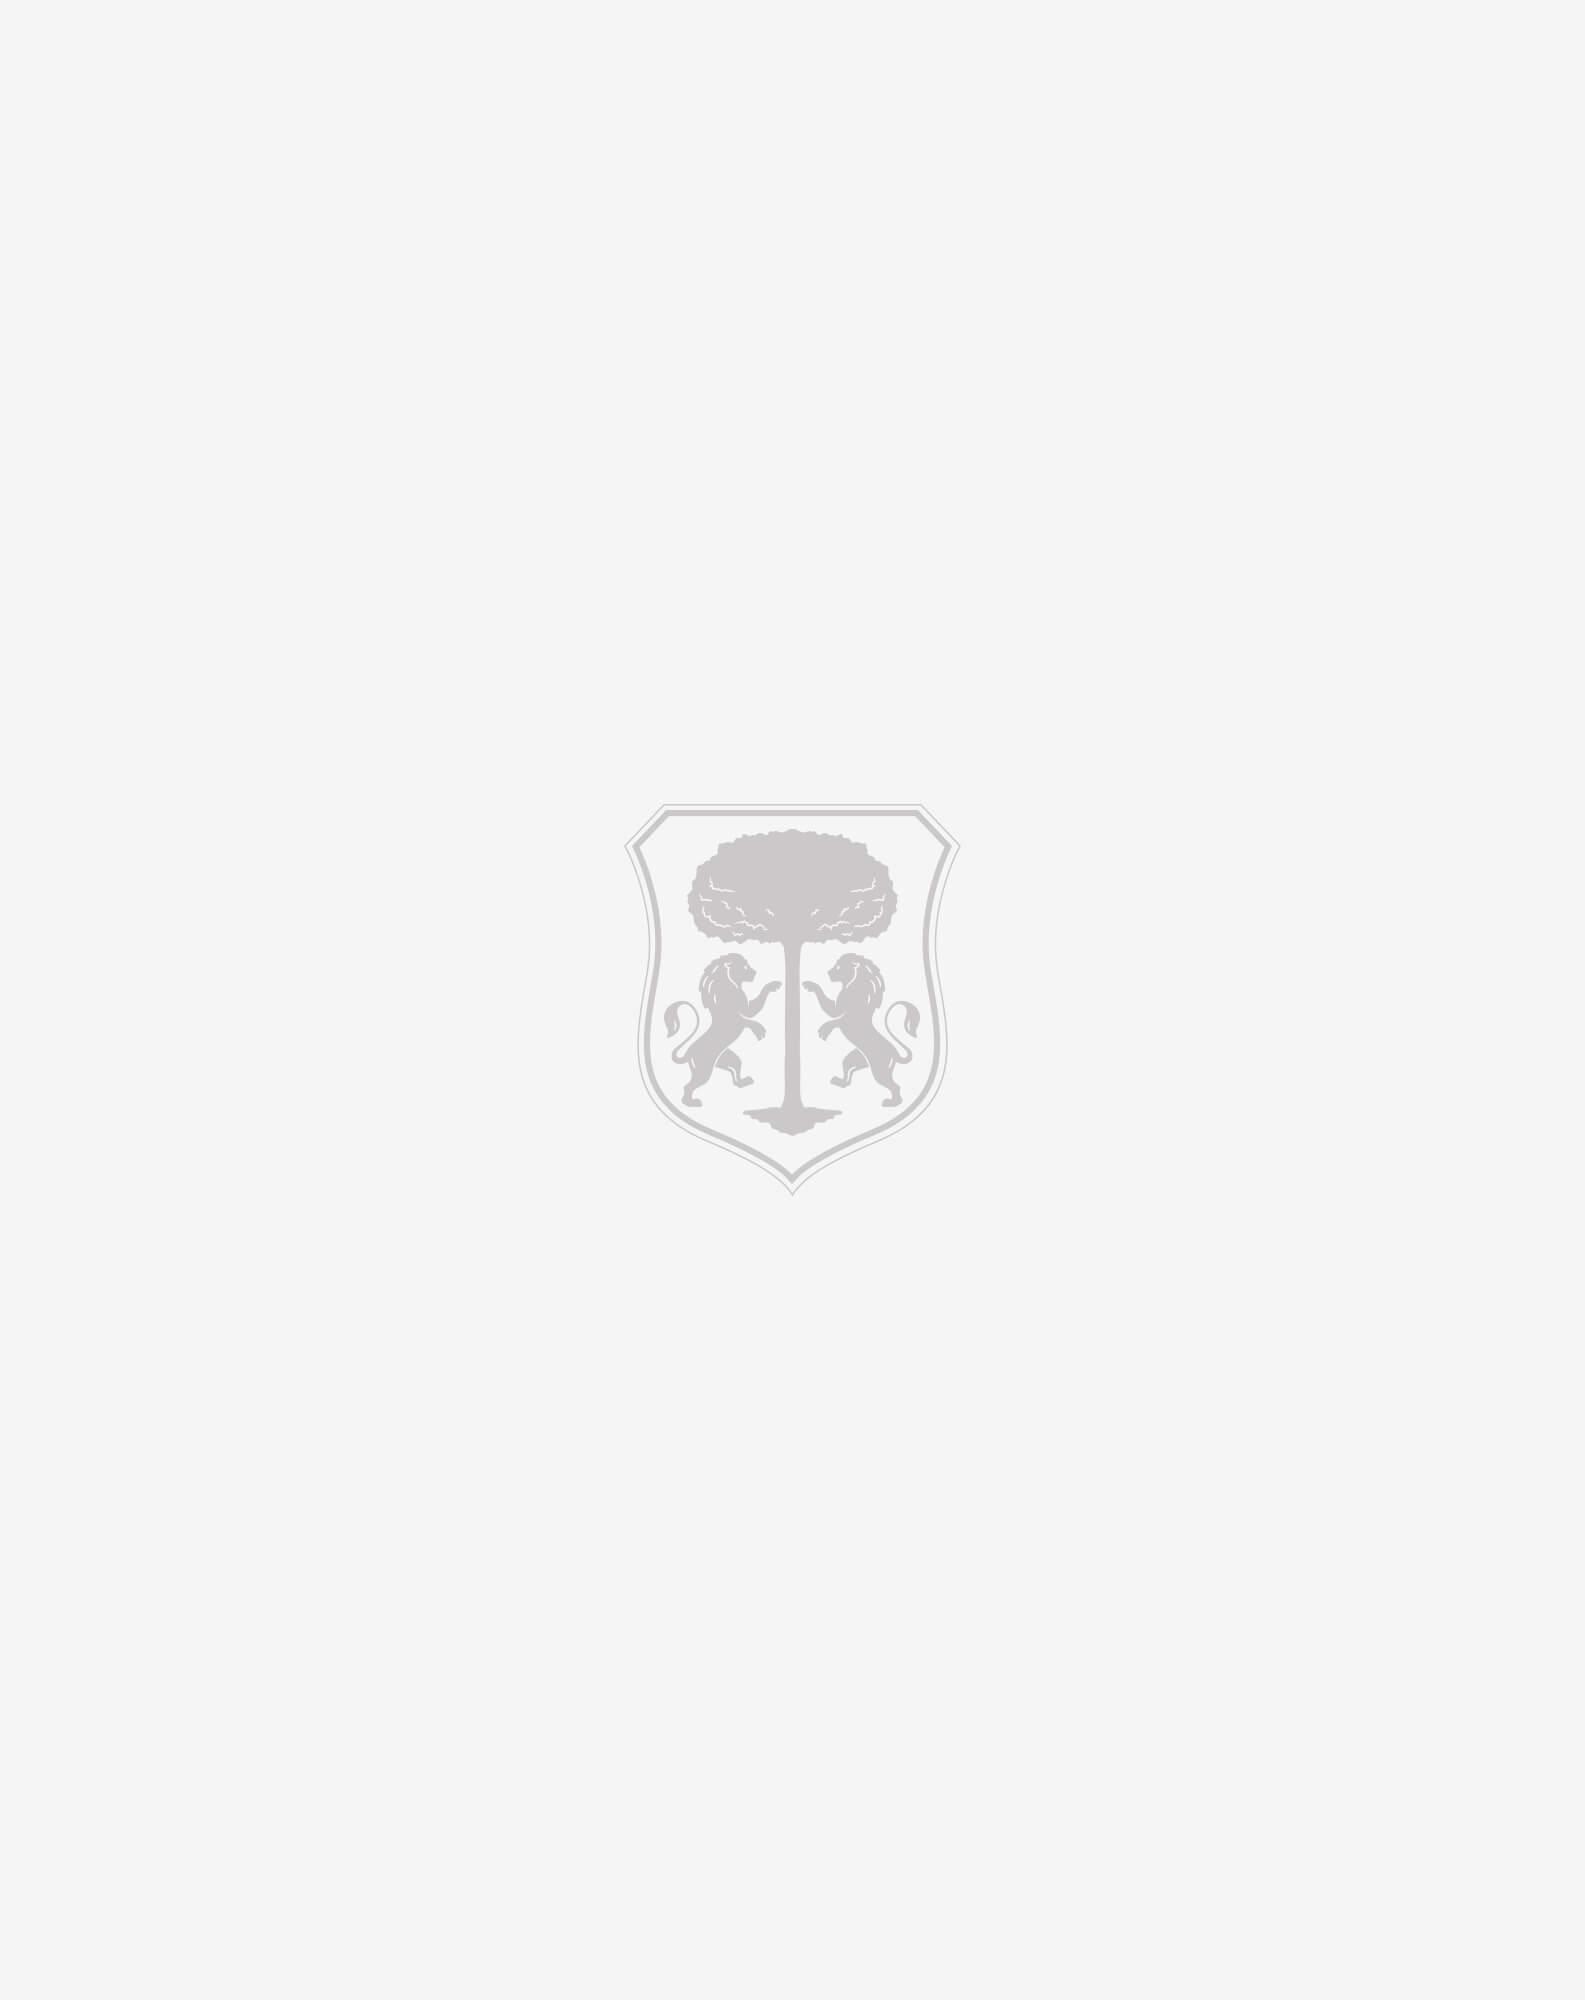 Violet regimental jacquard tie